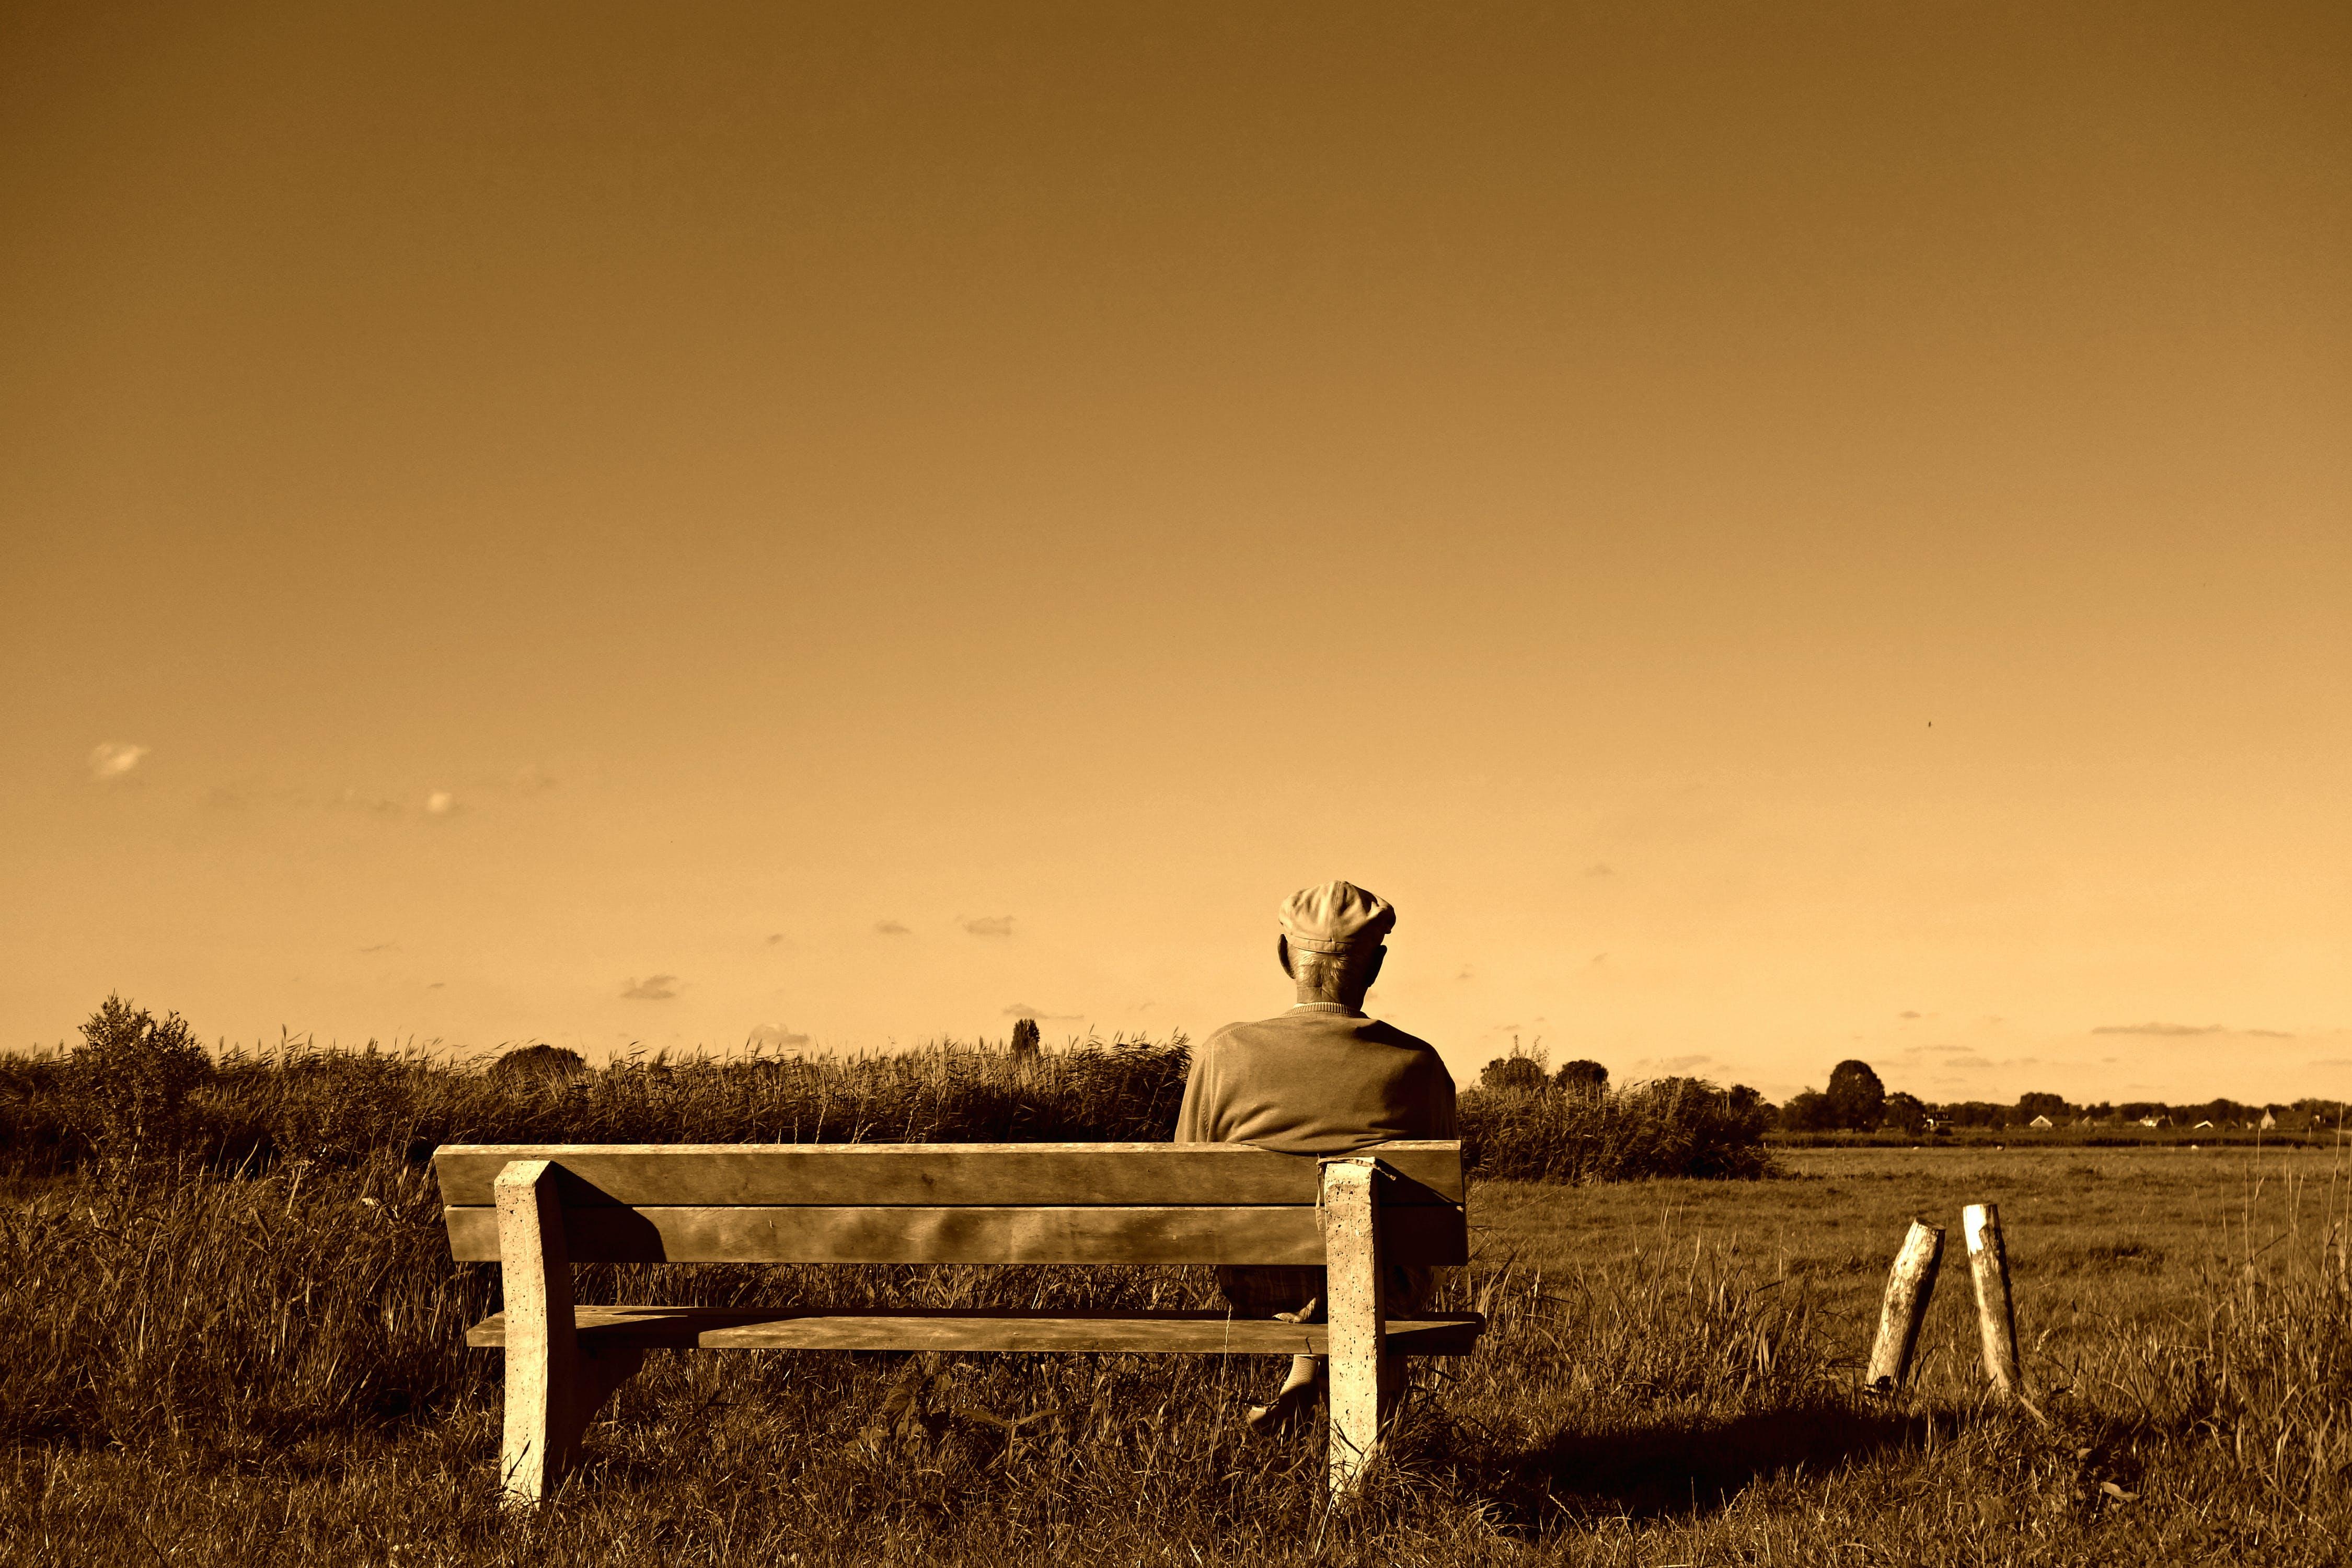 of bench, elderly, man, old man